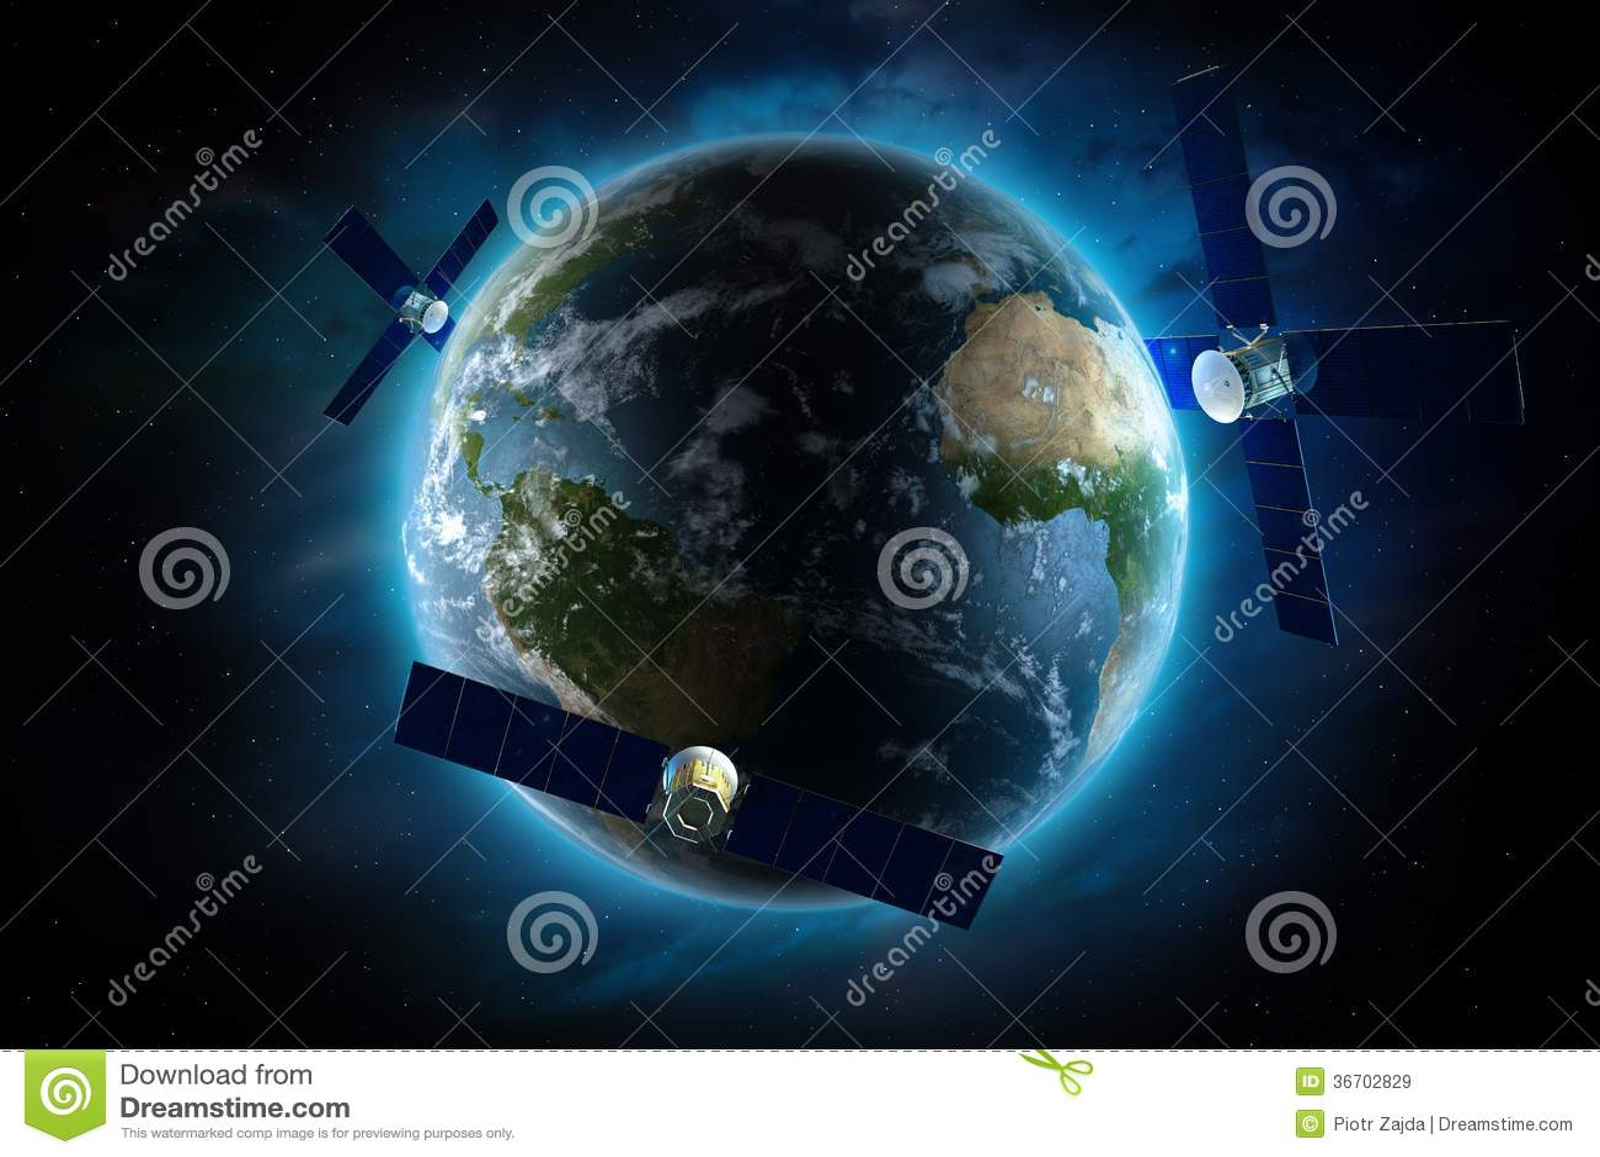 Satélites que están en órbita